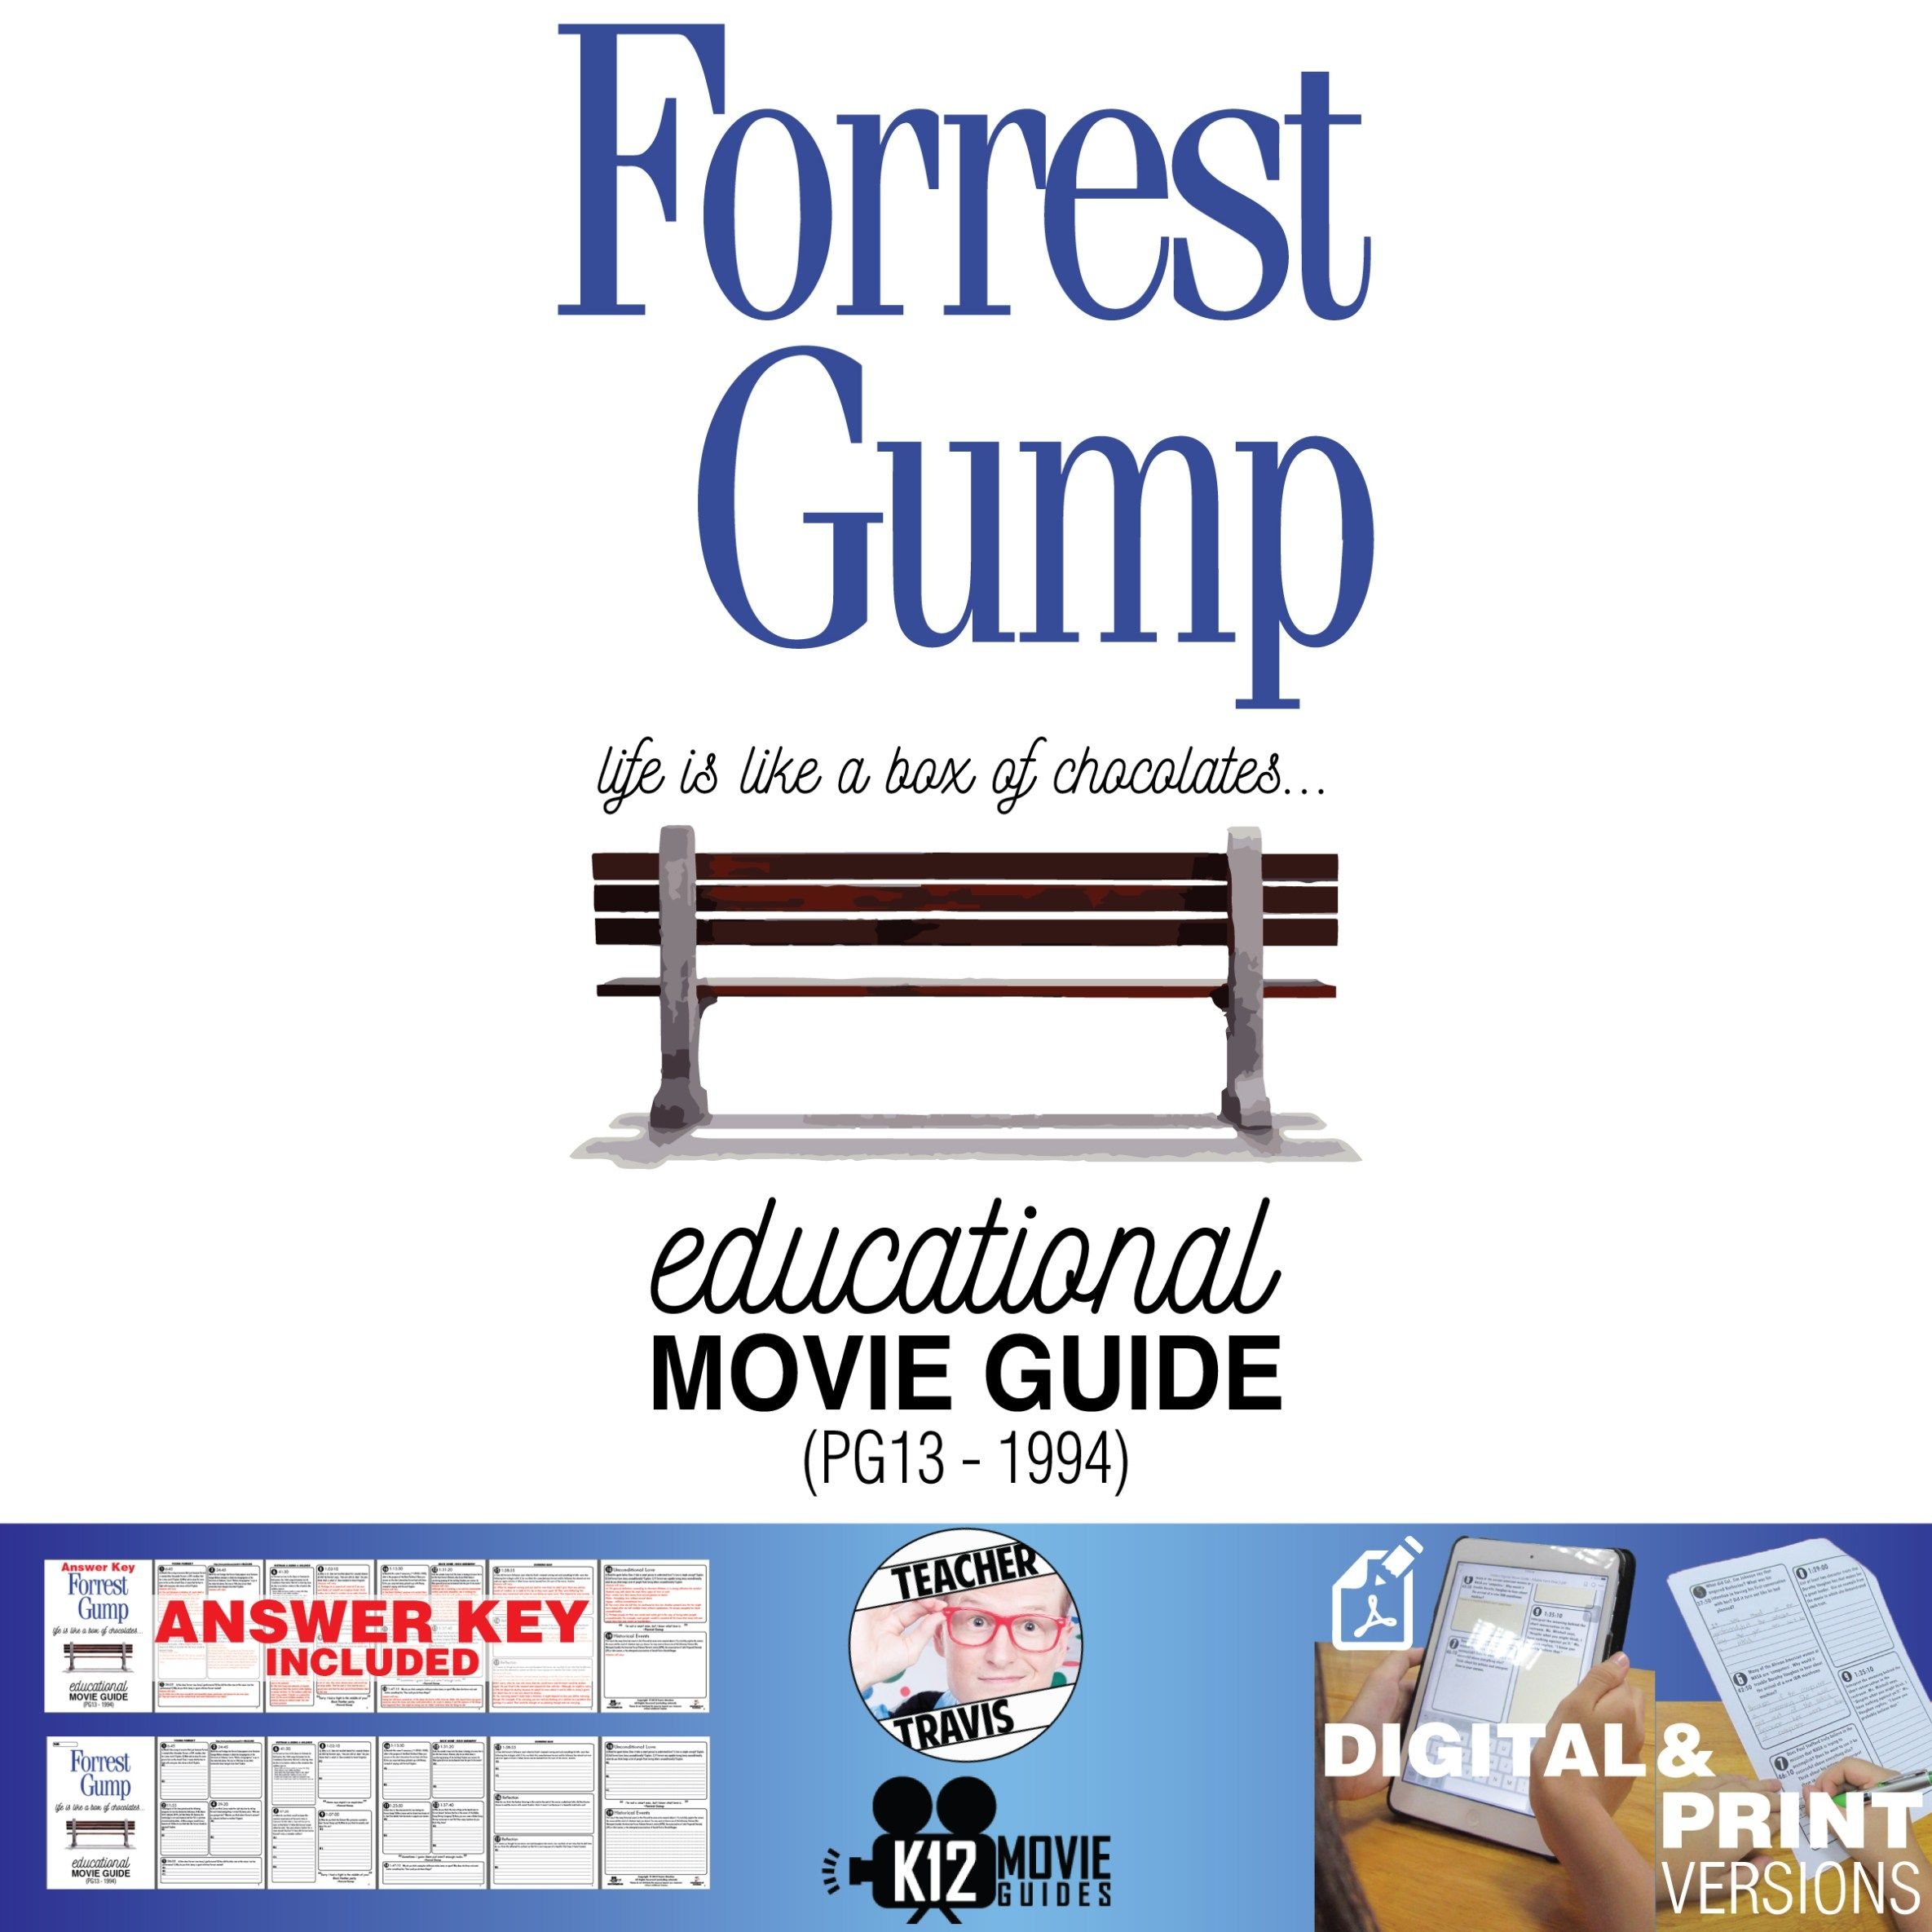 Forrest Gump Movie Guide